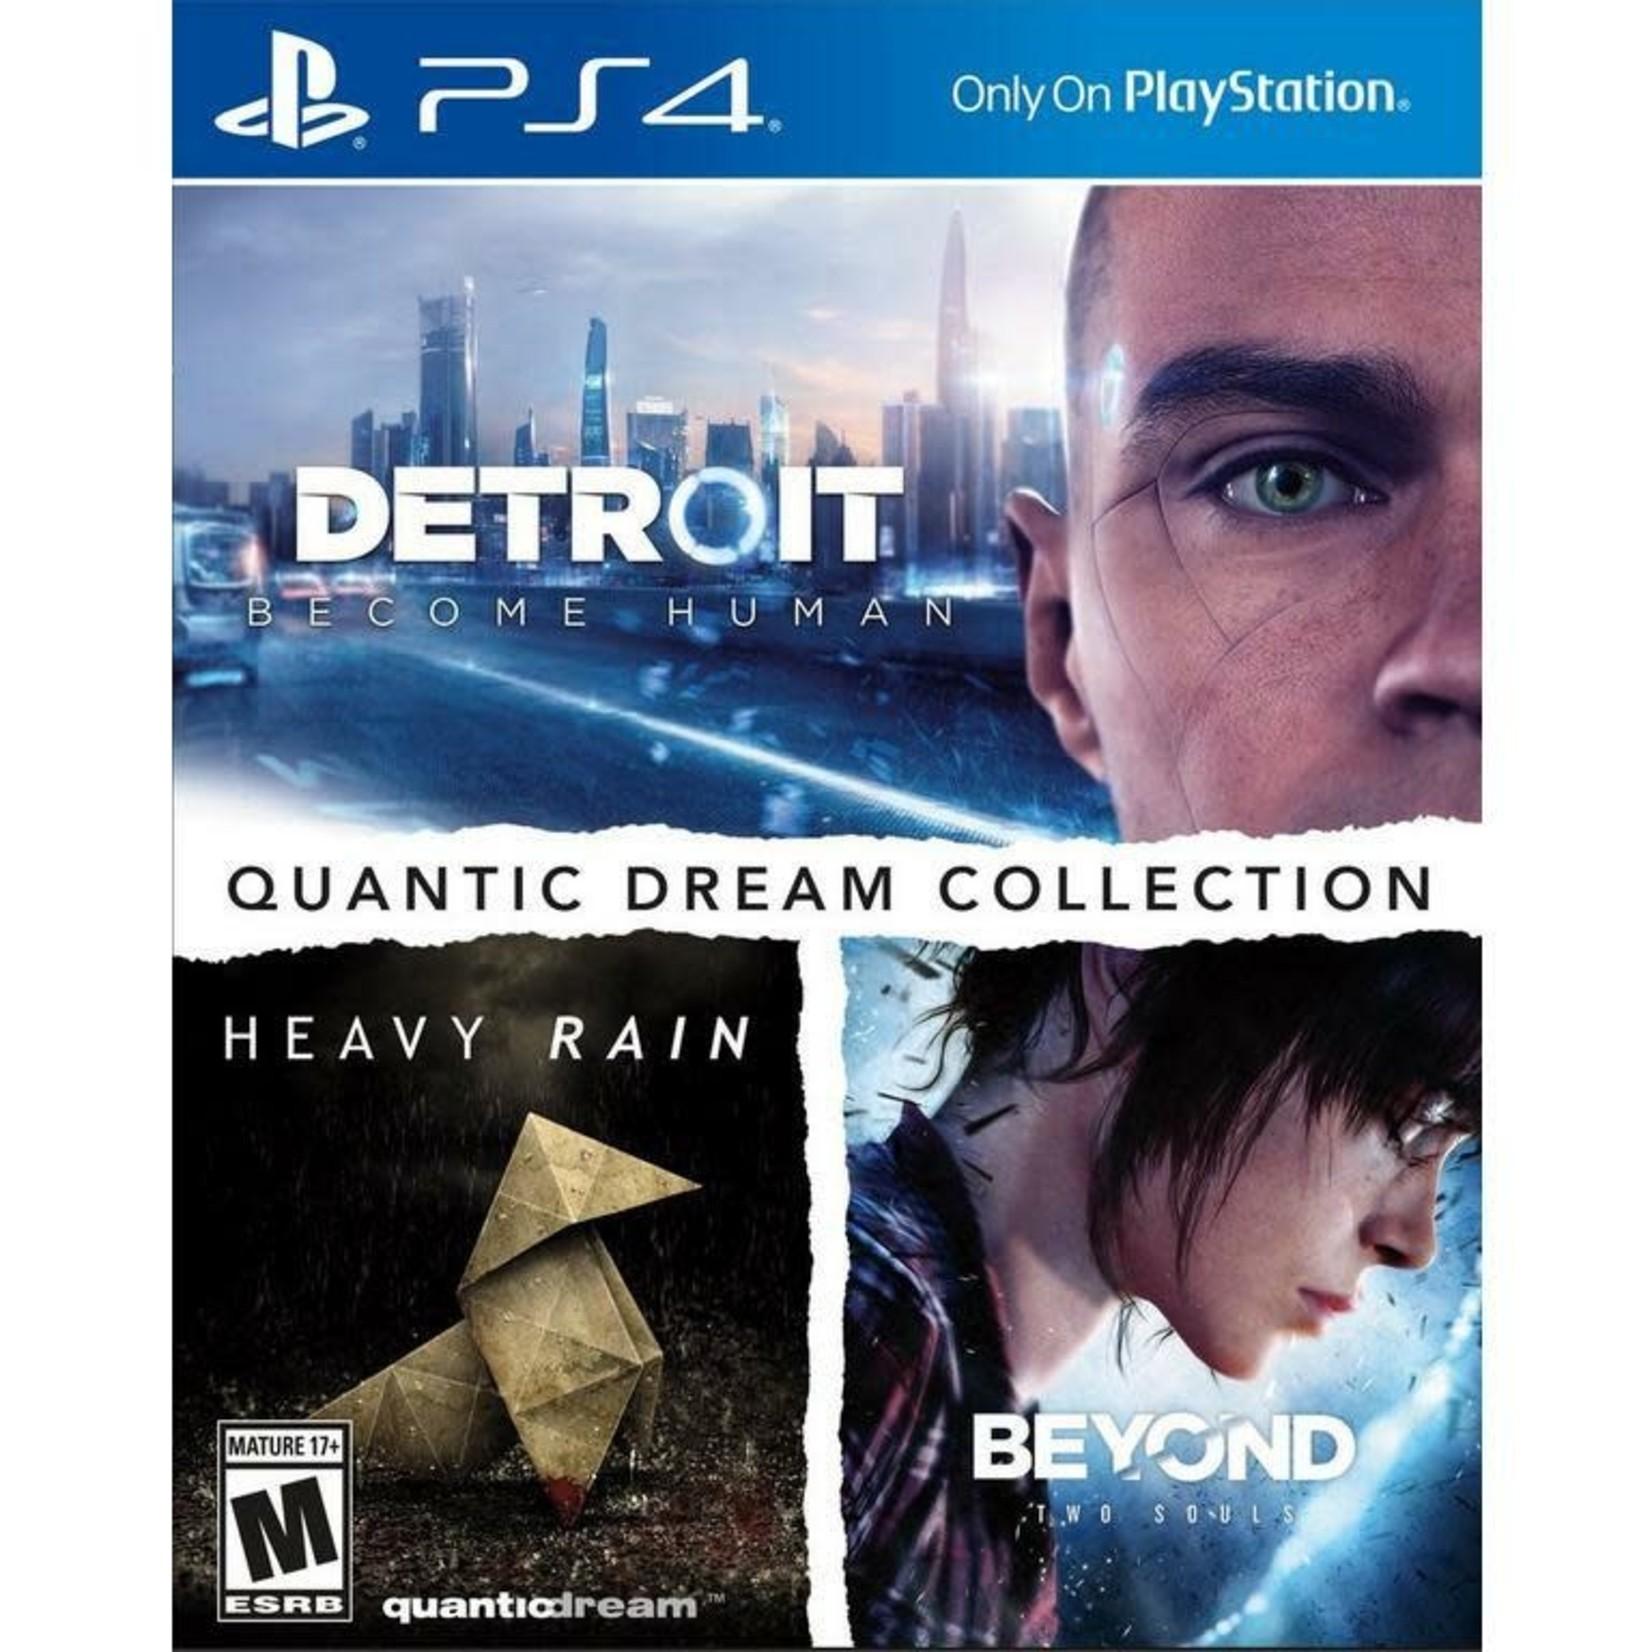 PS4-Quantic Dream Collection